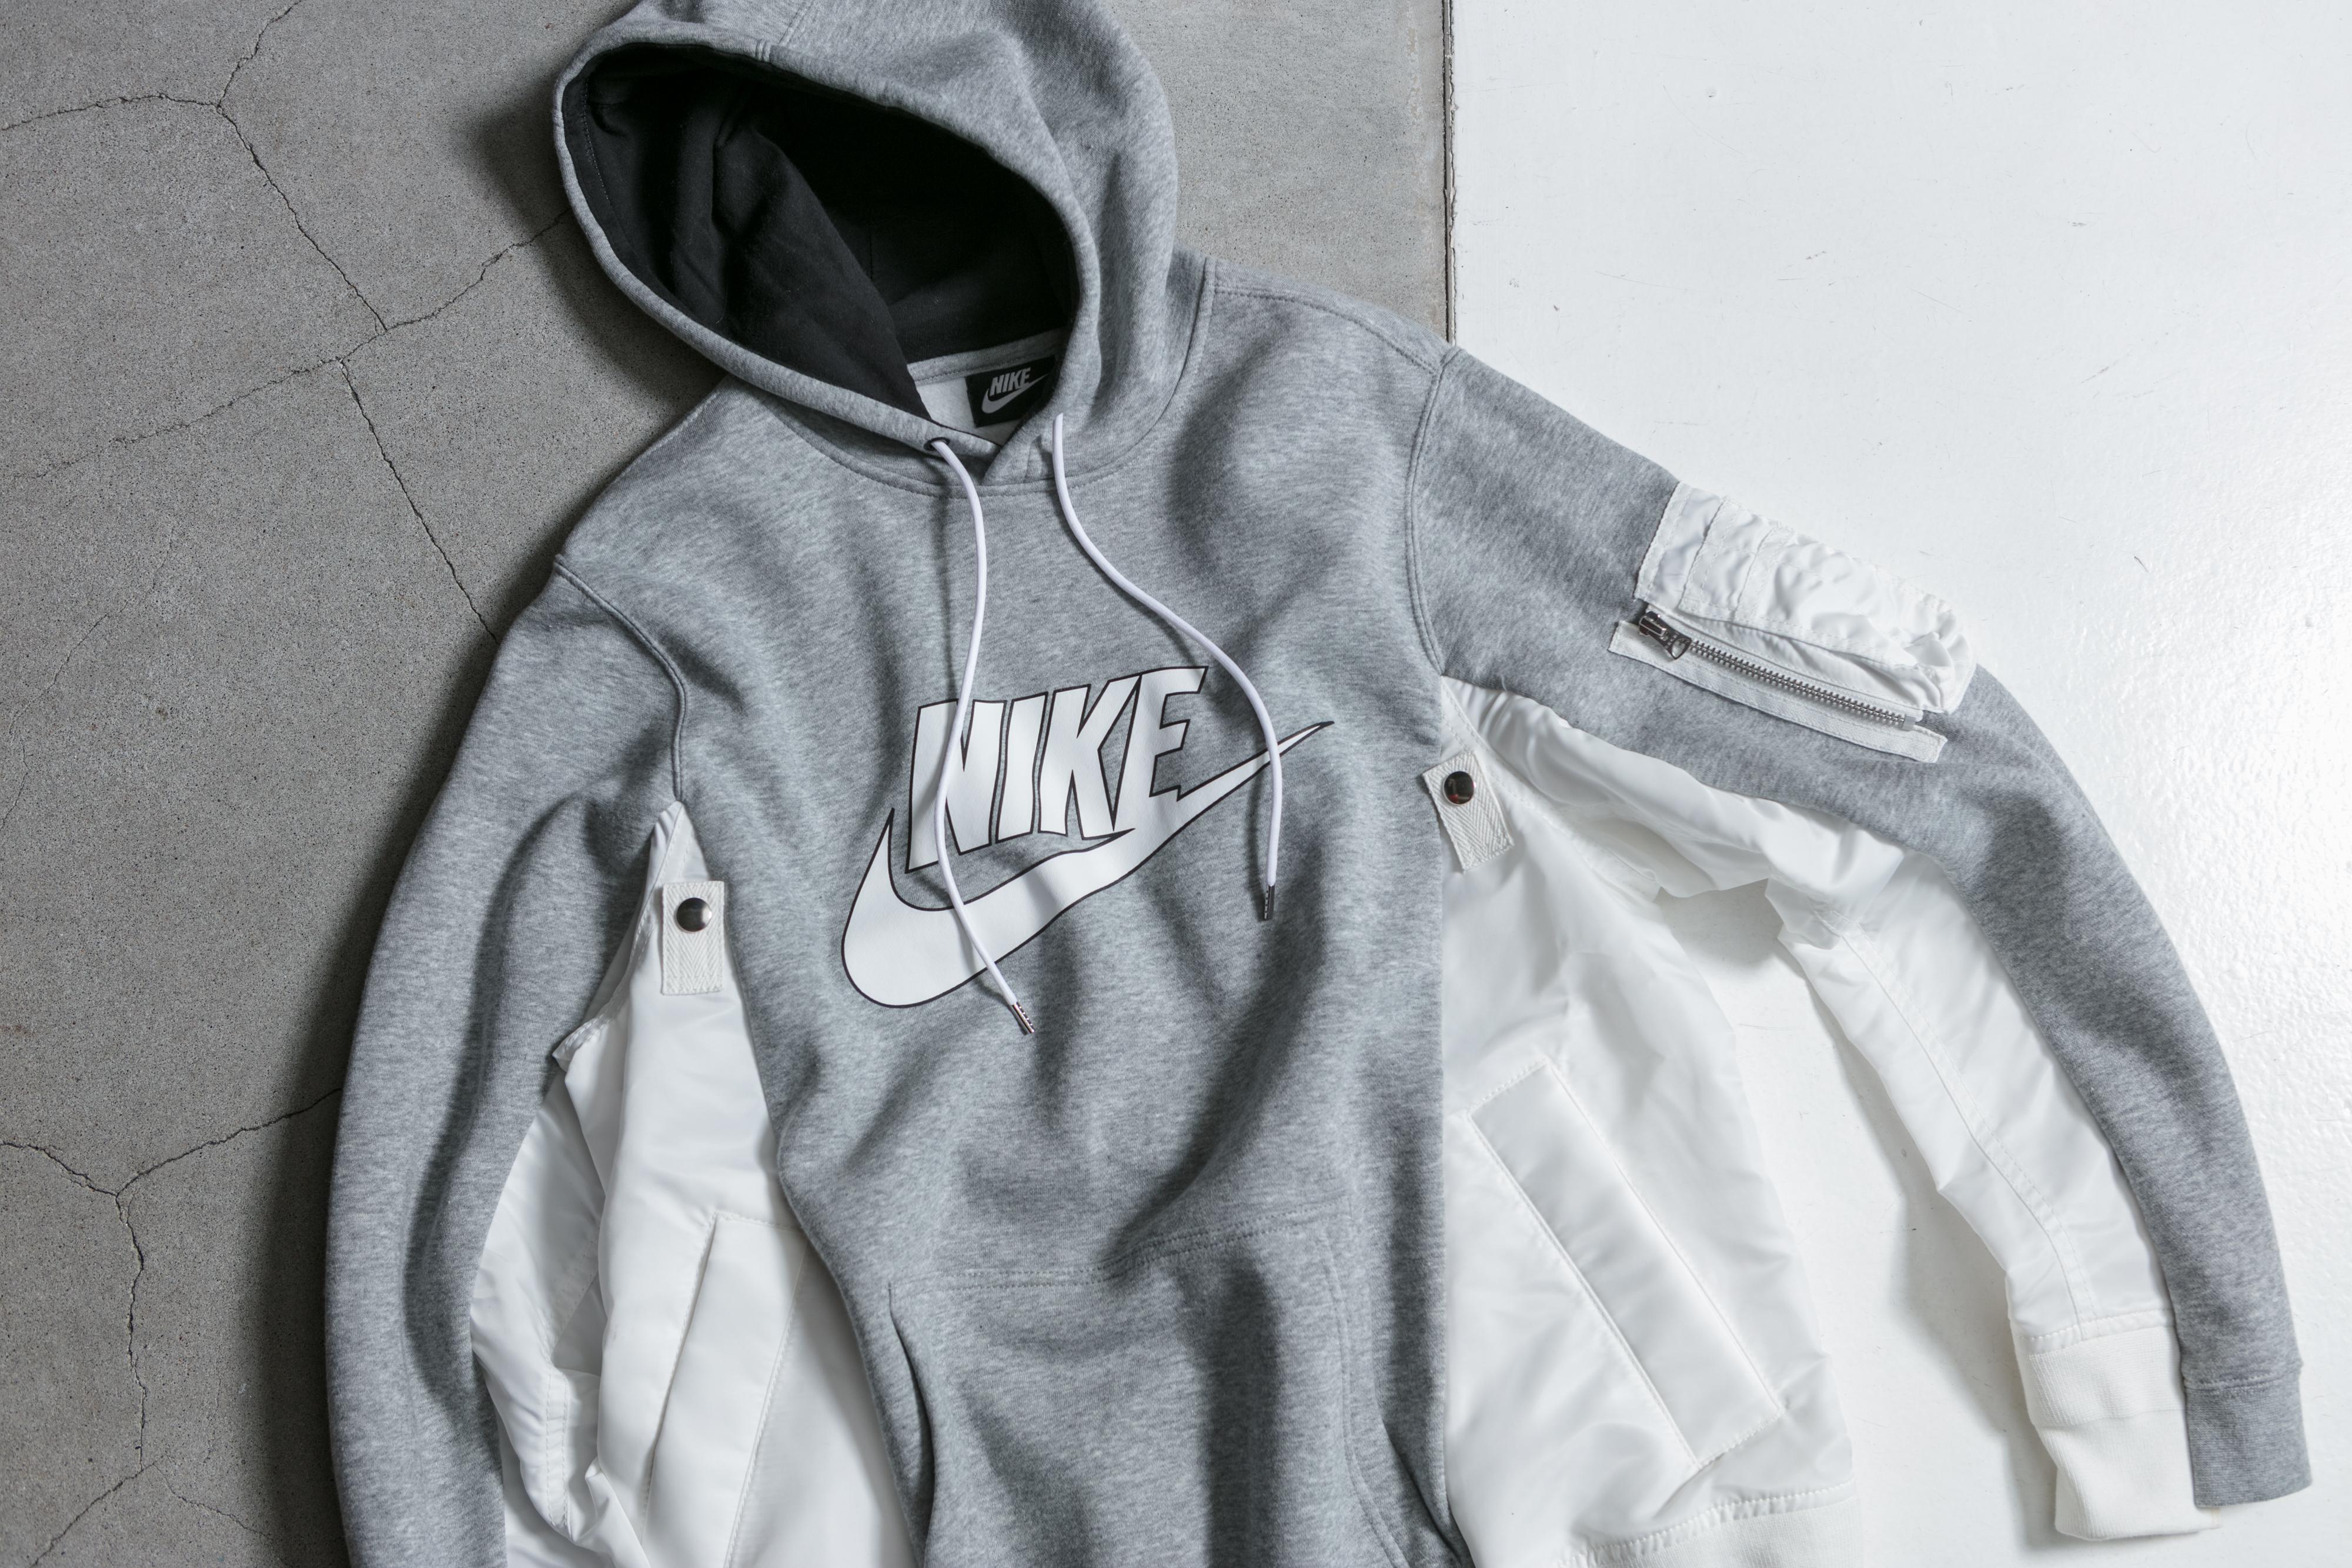 Nike RTW women